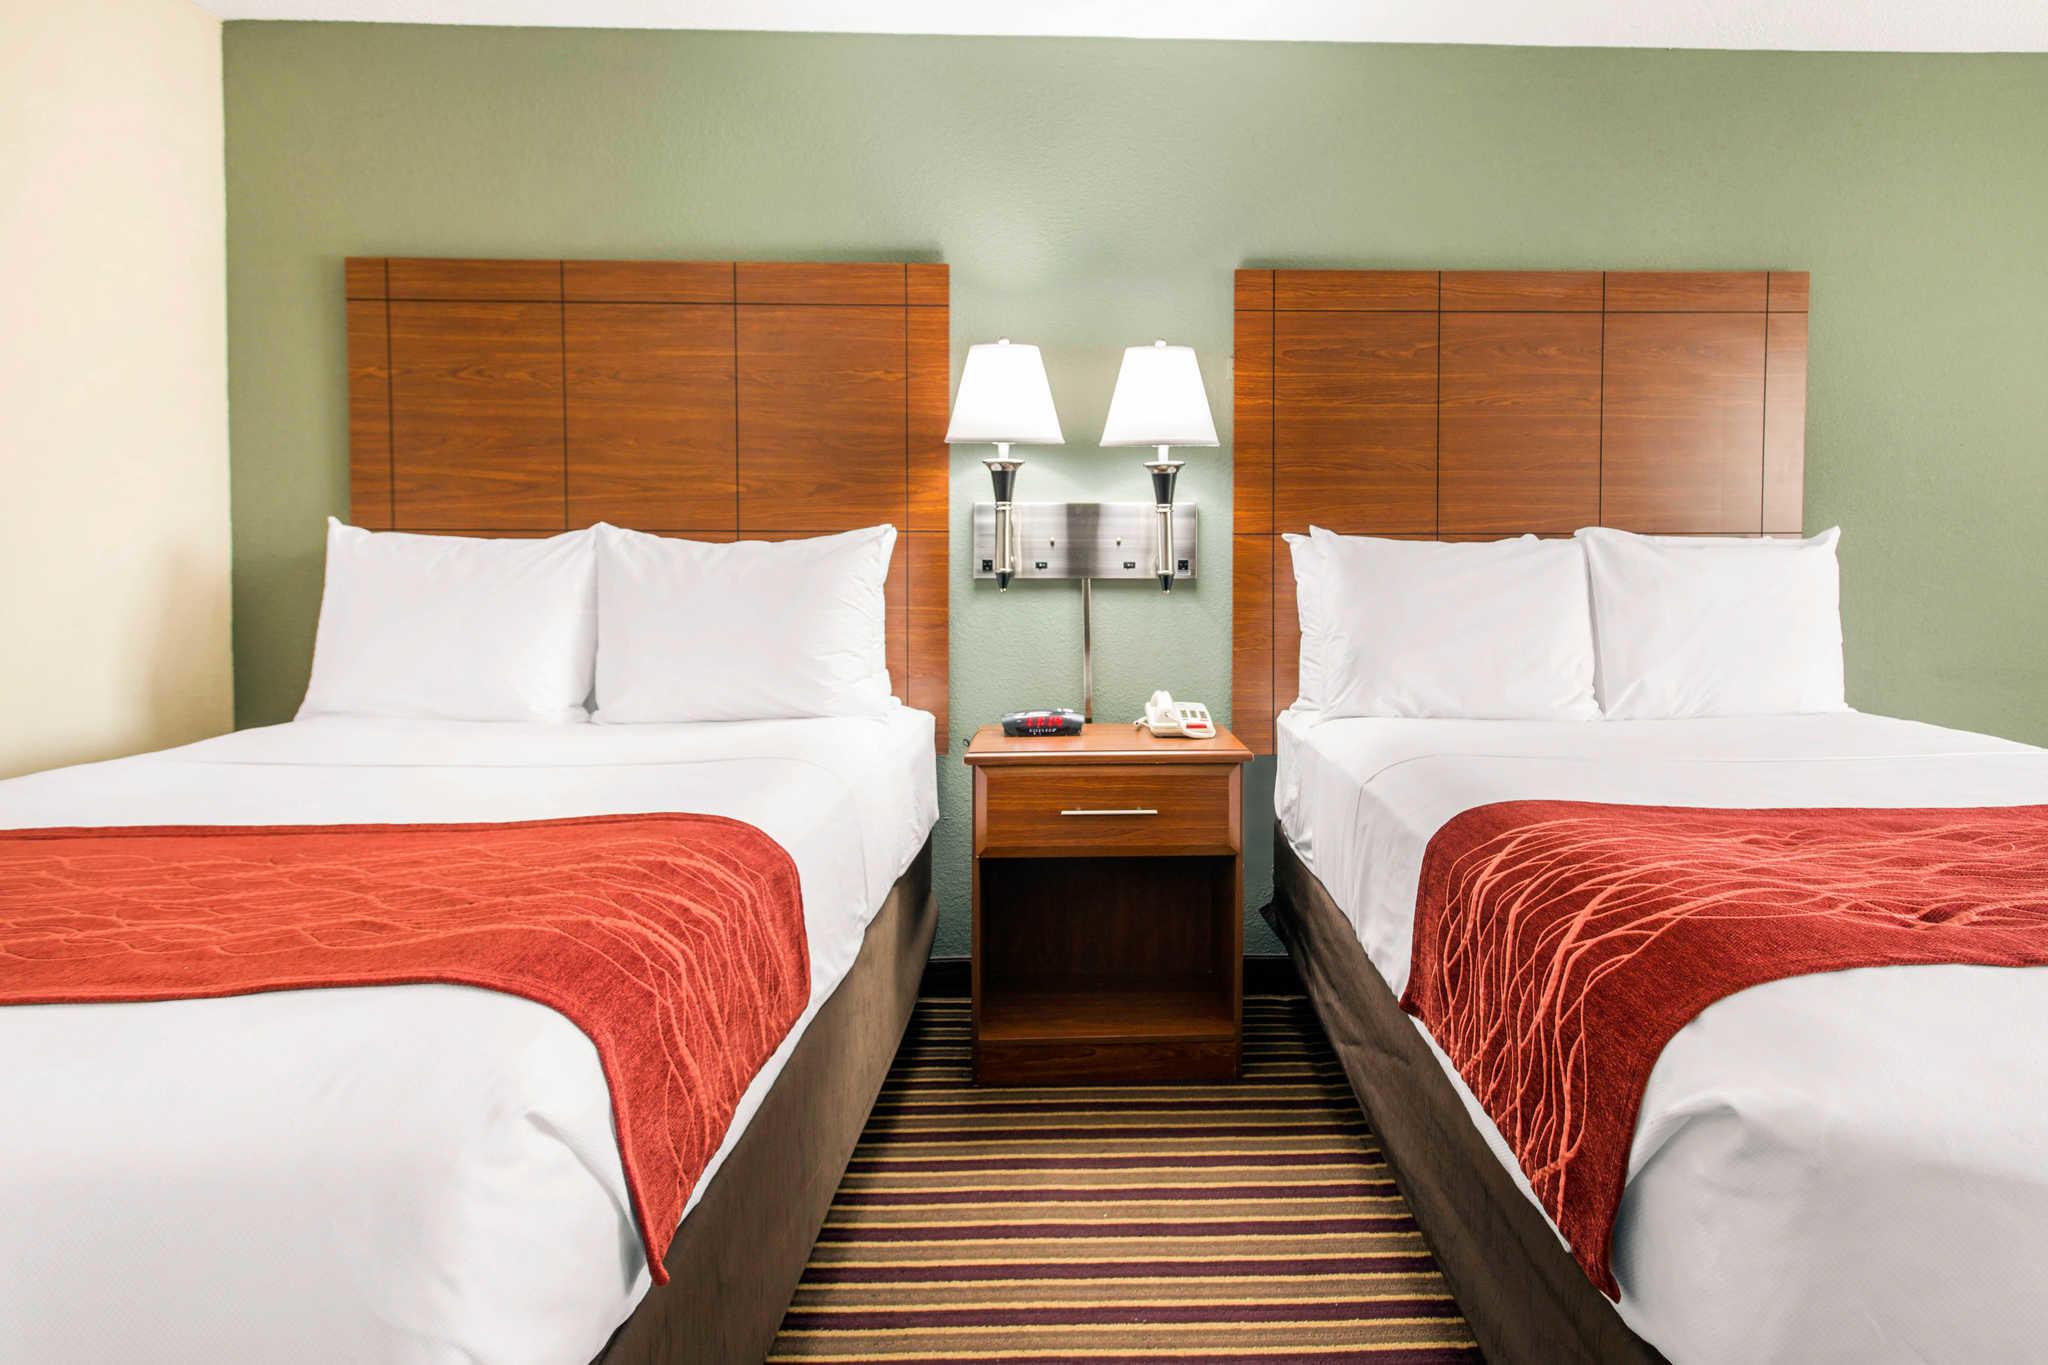 Comfort Inn & Suites Crabtree Valley image 24